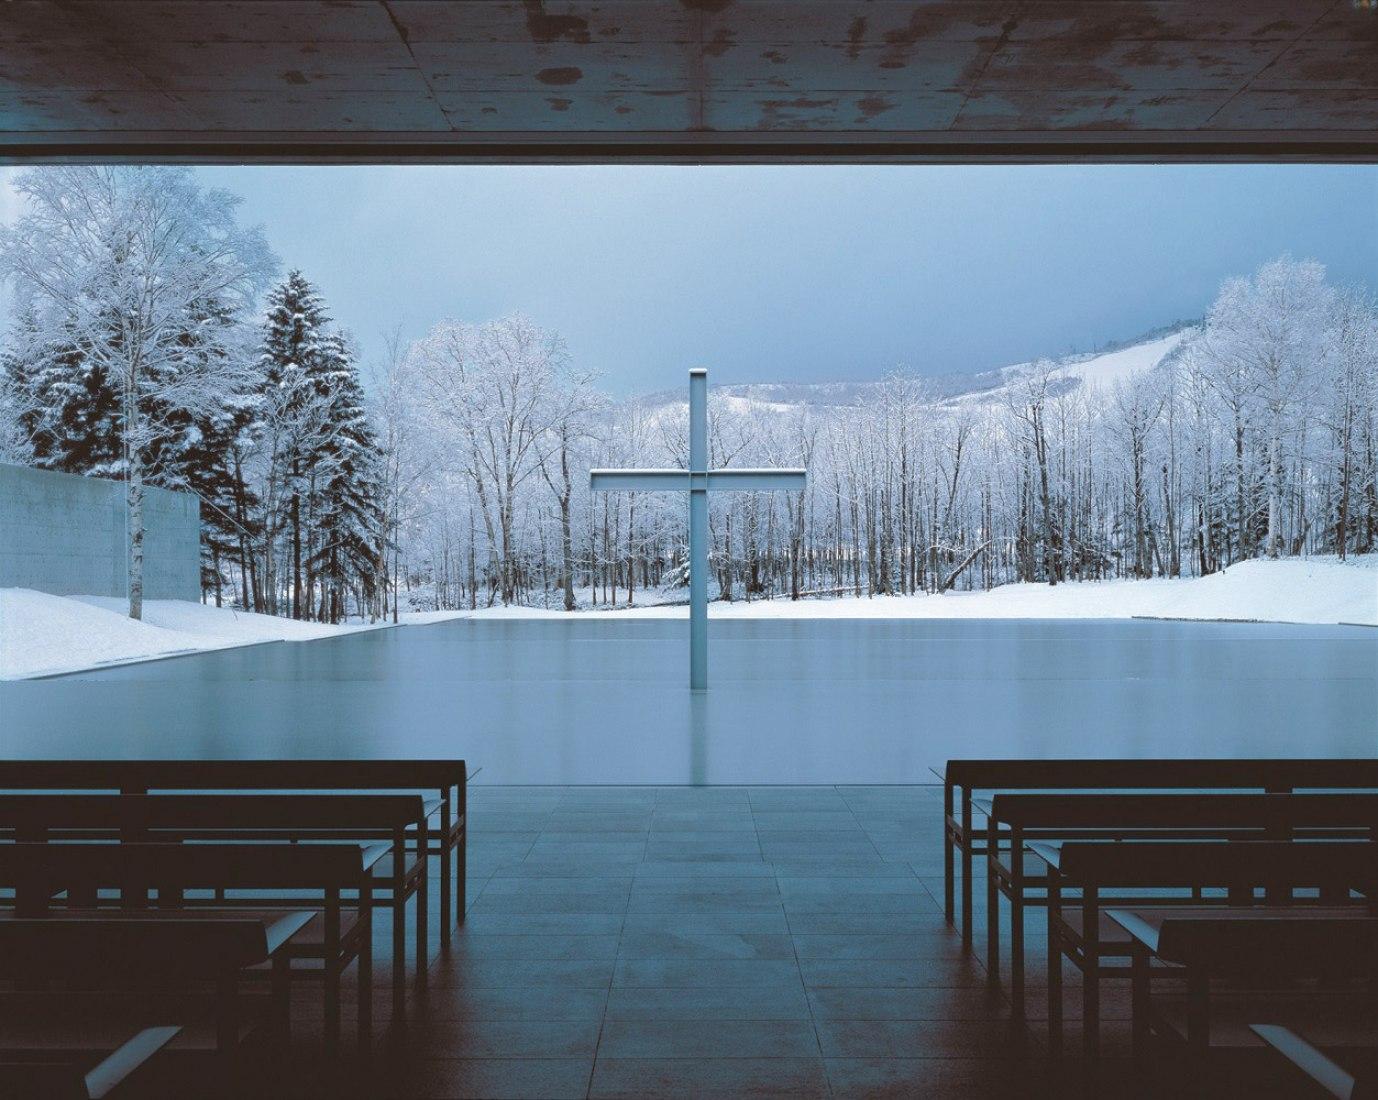 Iglesia en el agua (1988) Yufutsu-gun, Hokkaido. Fotografía por Yoshio Shiratori. Cortesía de The National Art Center Tokyo.